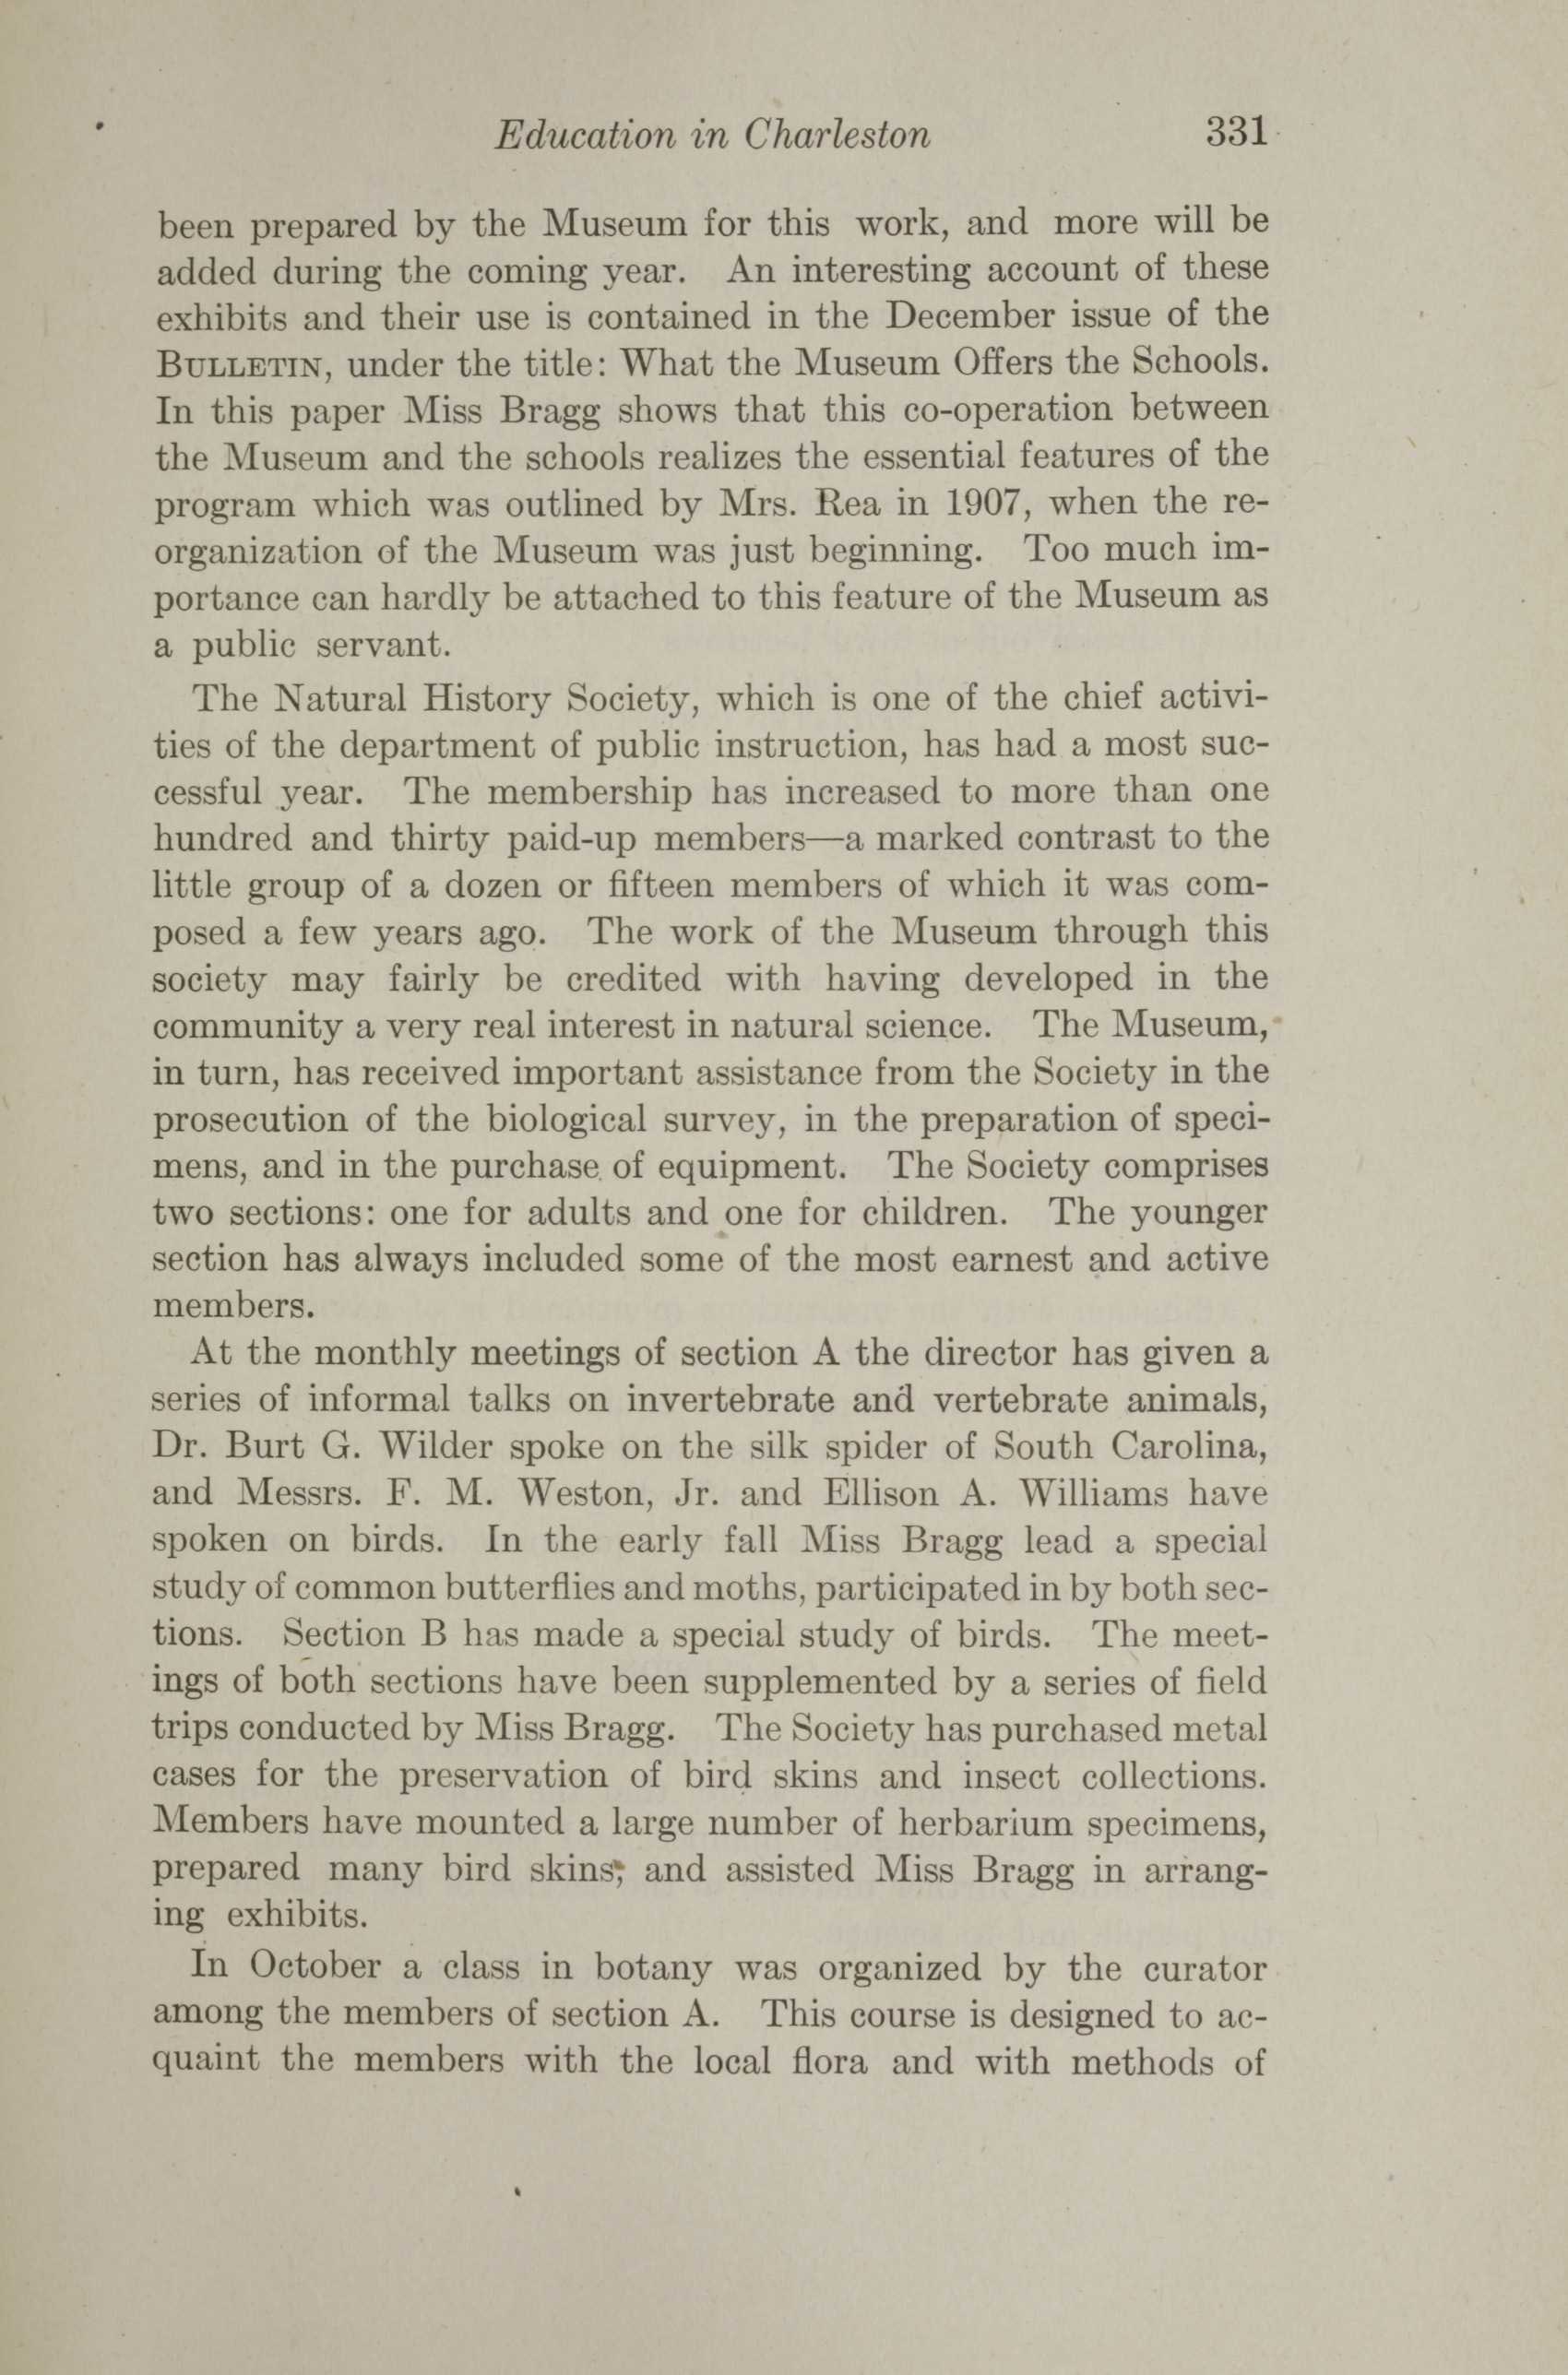 Charleston Yearbook, 1912, page 331